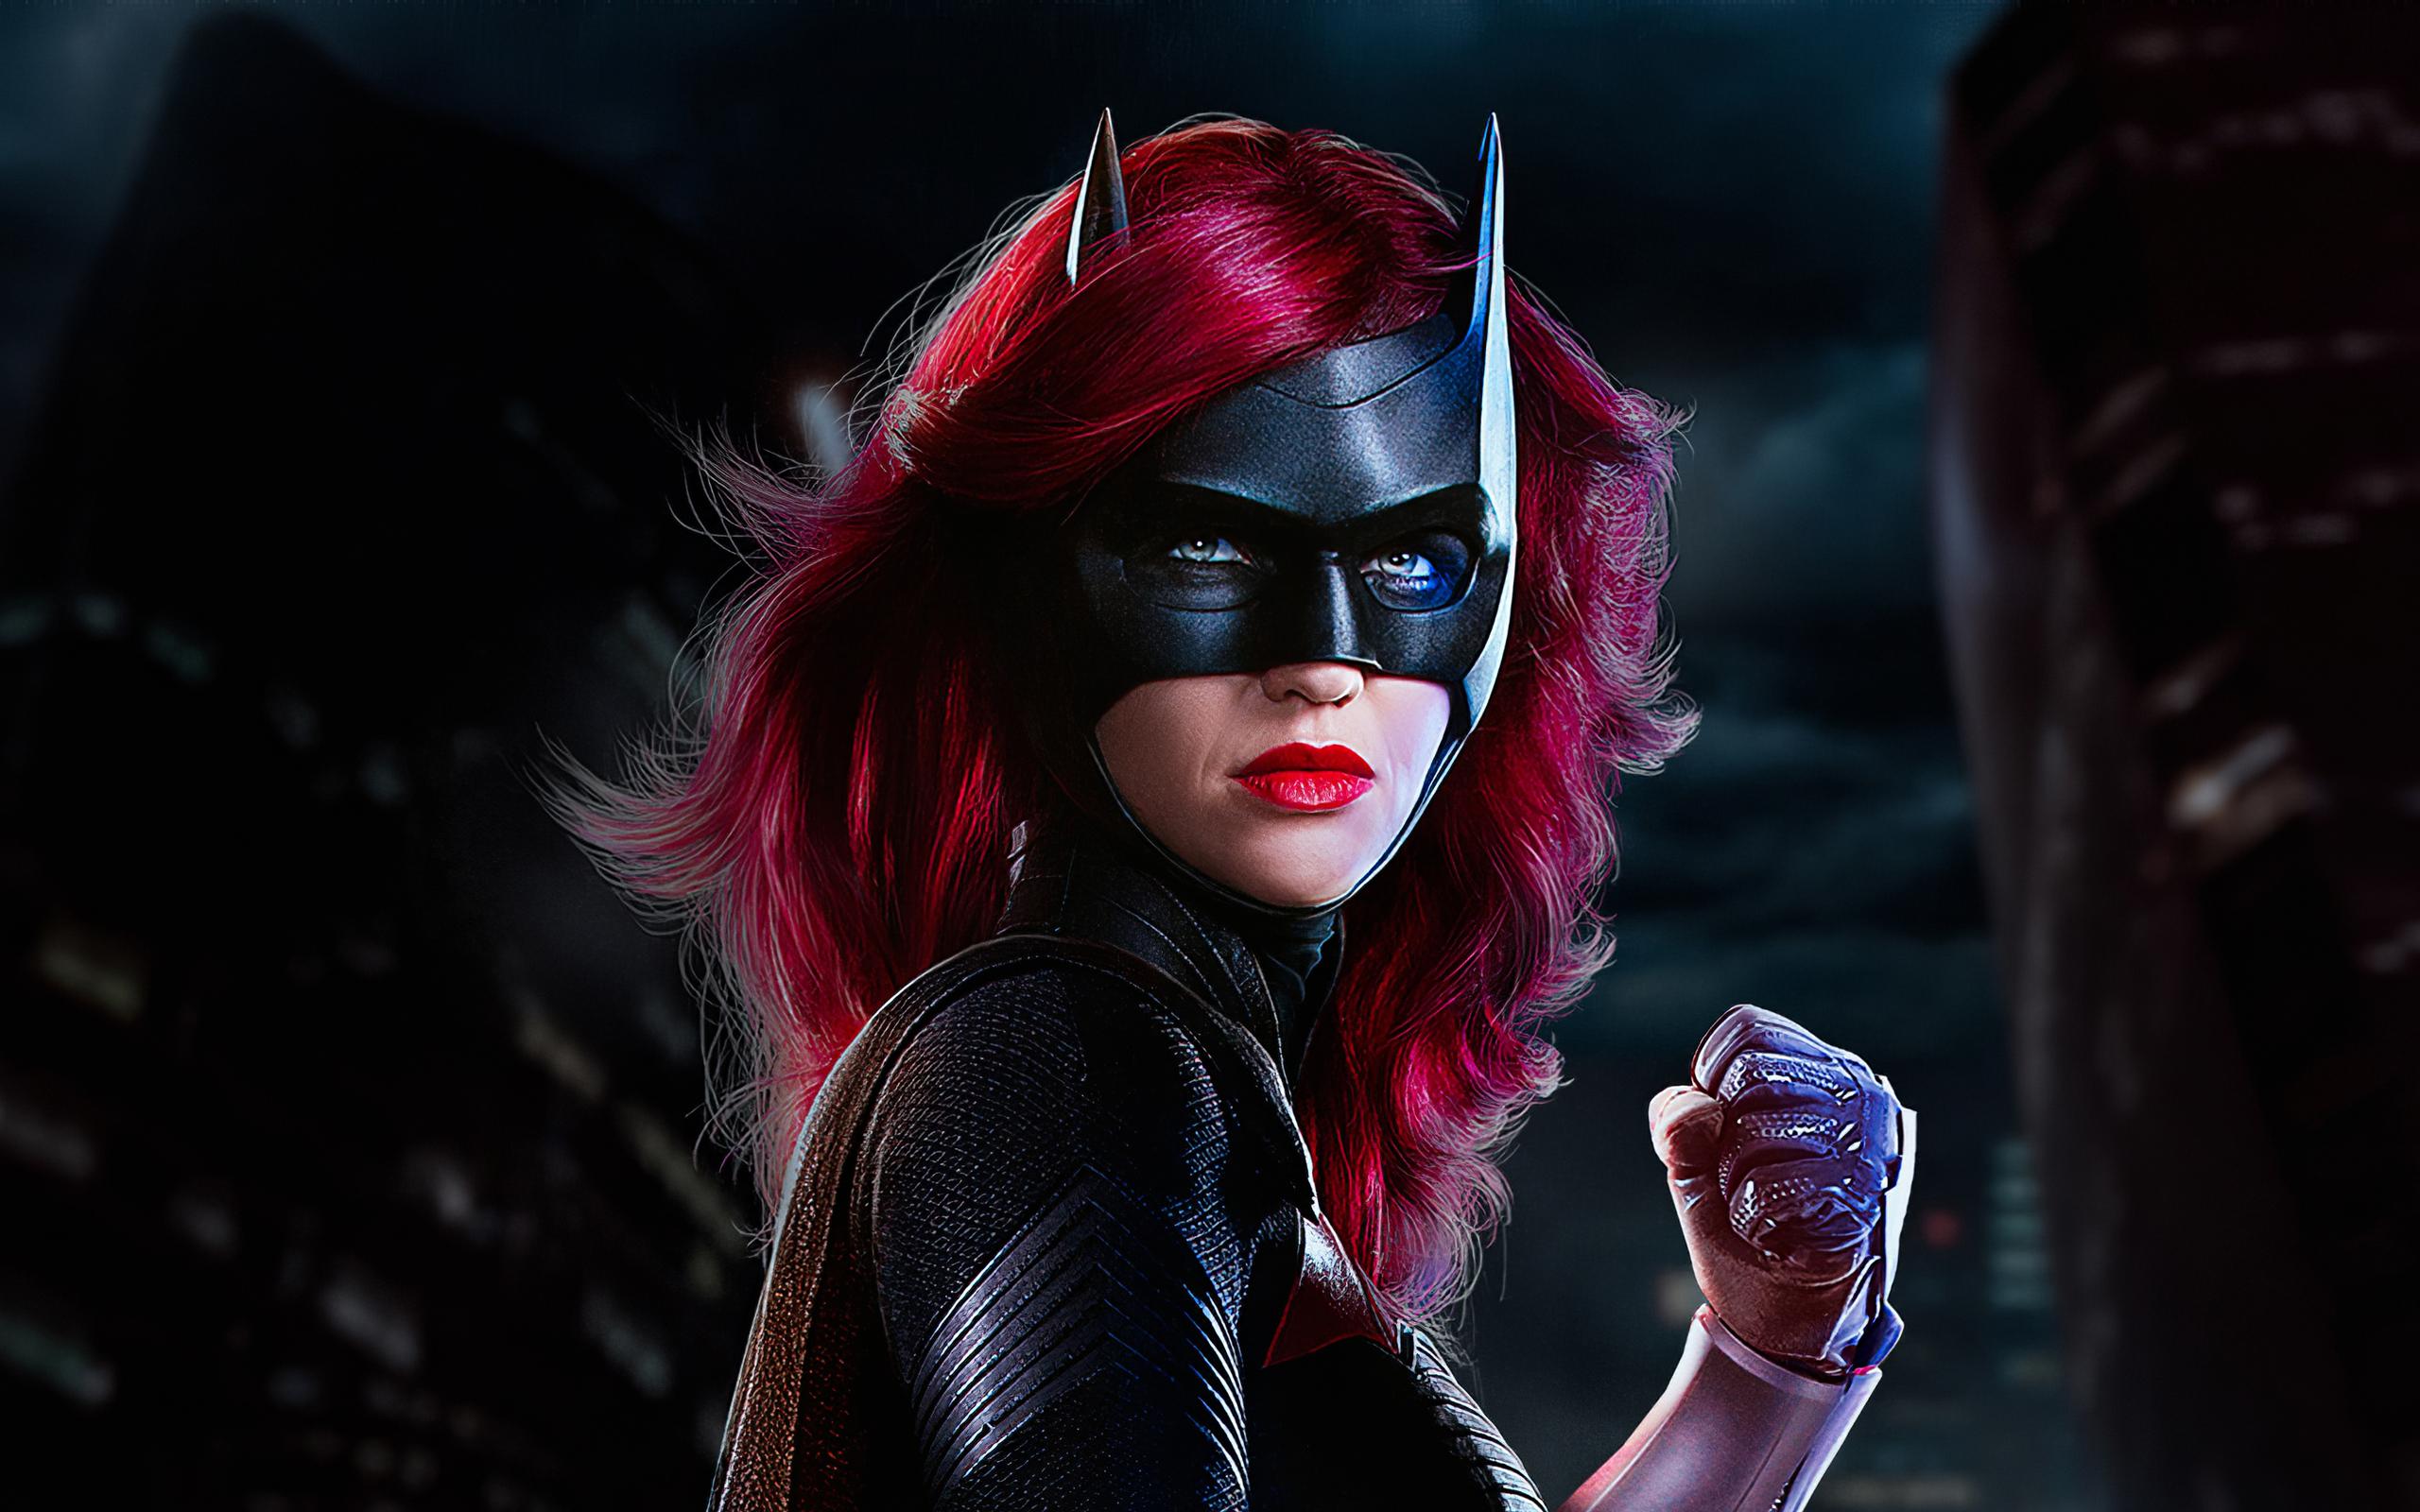 batwoman-4k-2020-7j.jpg